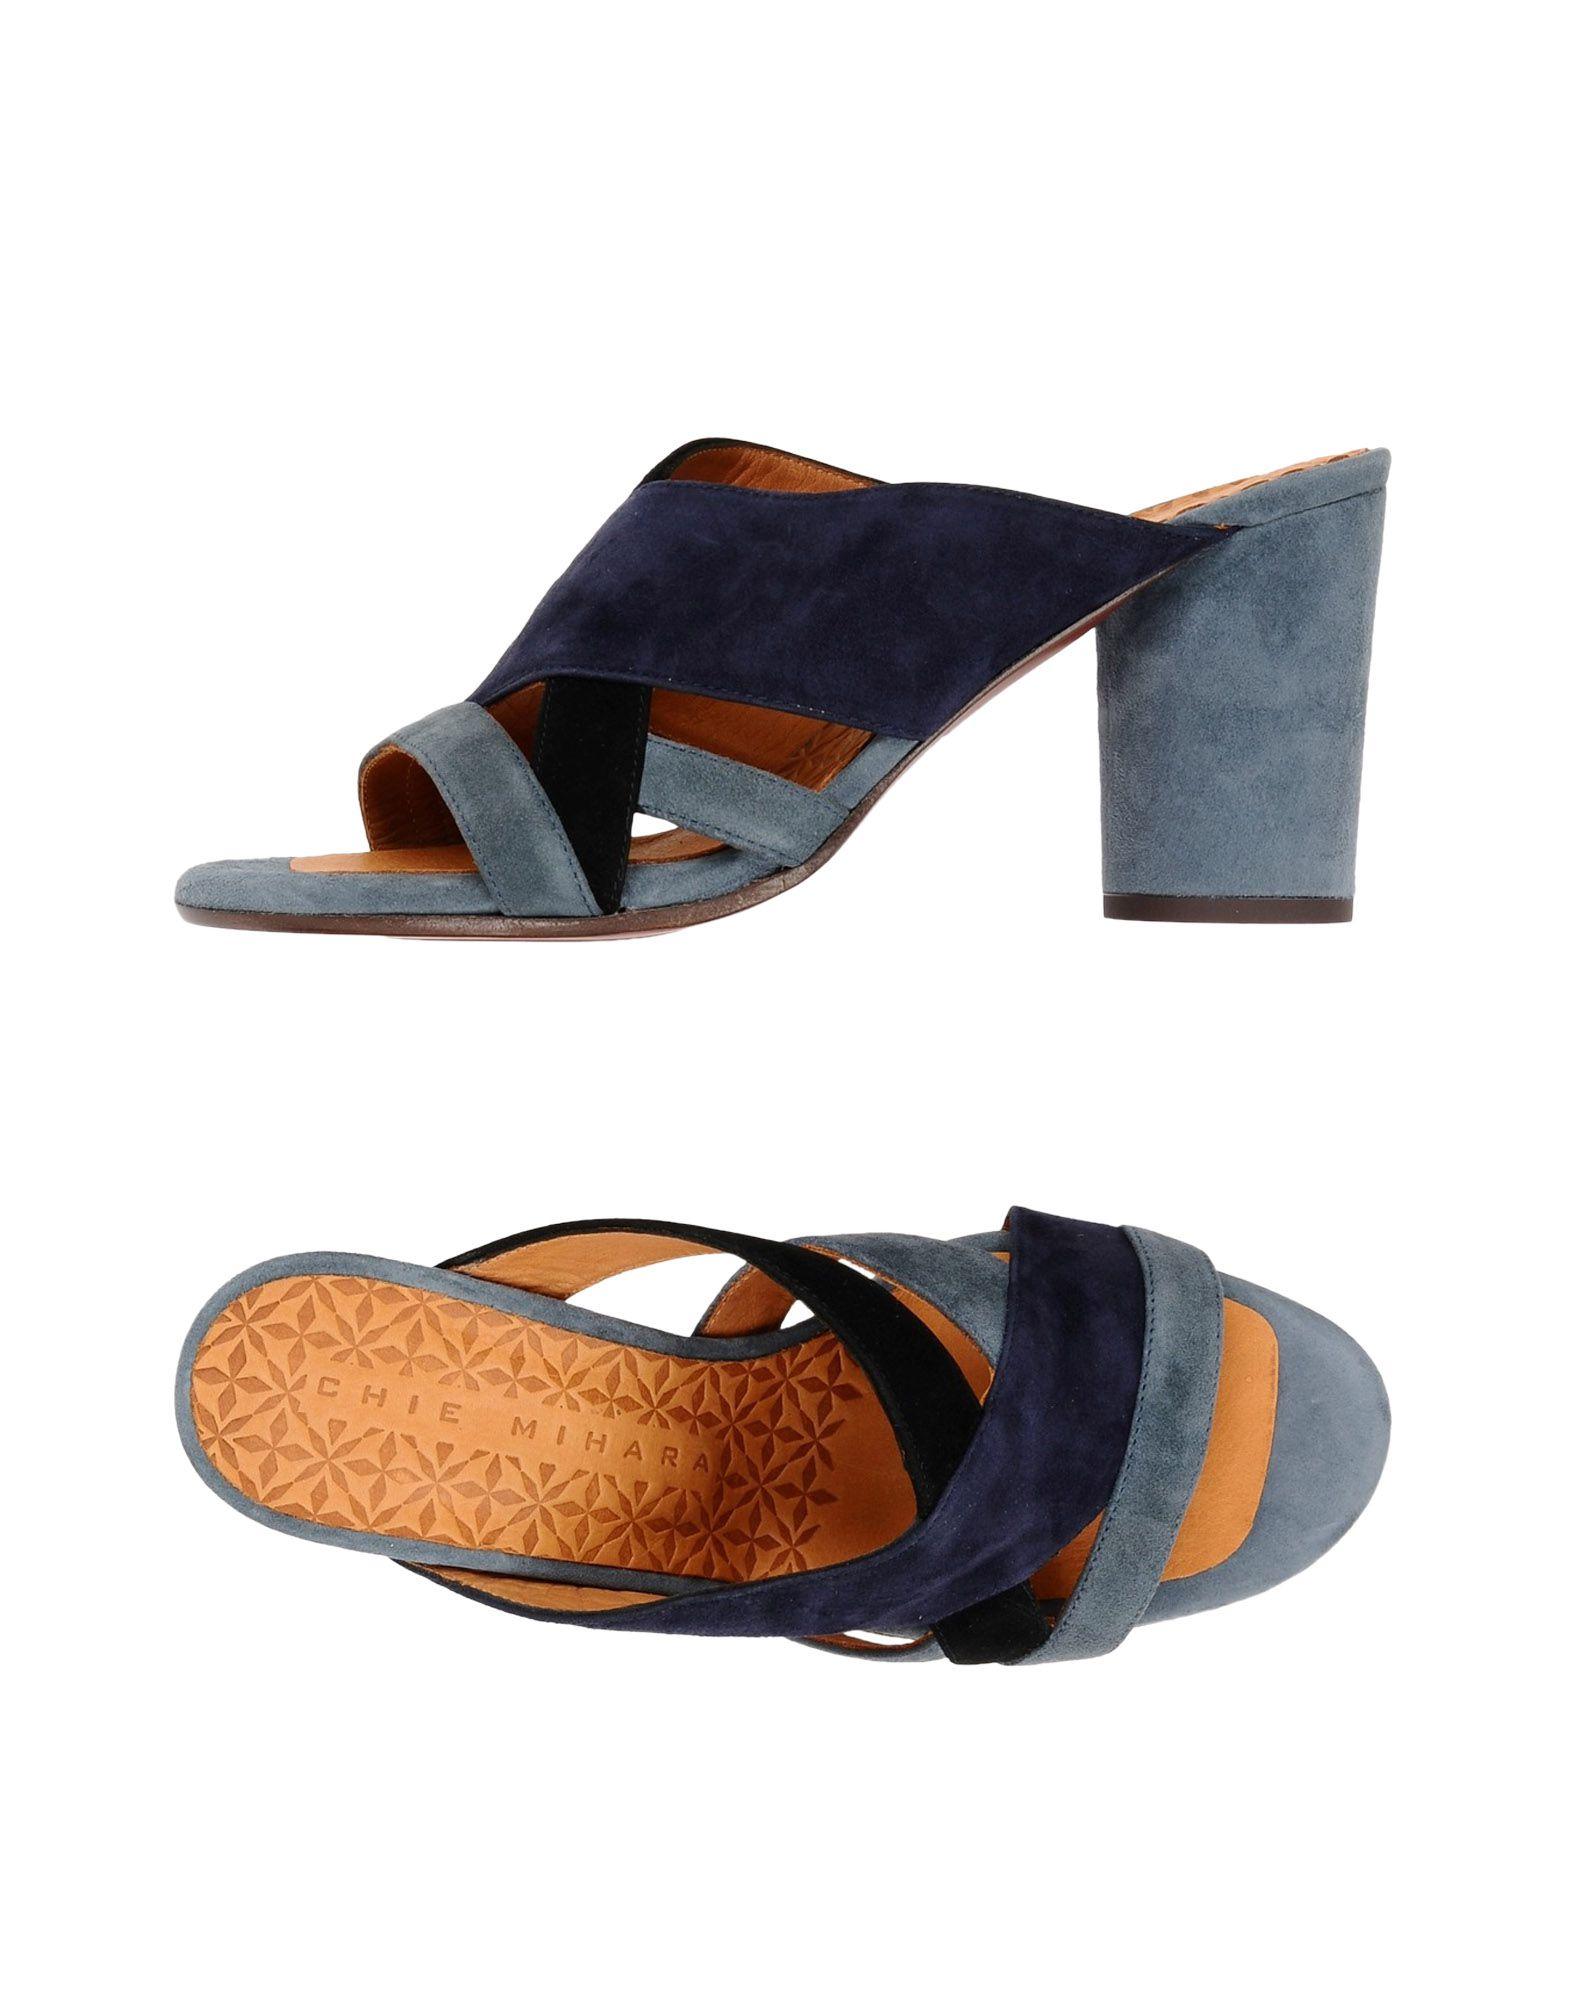 Sandales Chie Mihara Uni - Femme - Sandales Chie Mihara sur